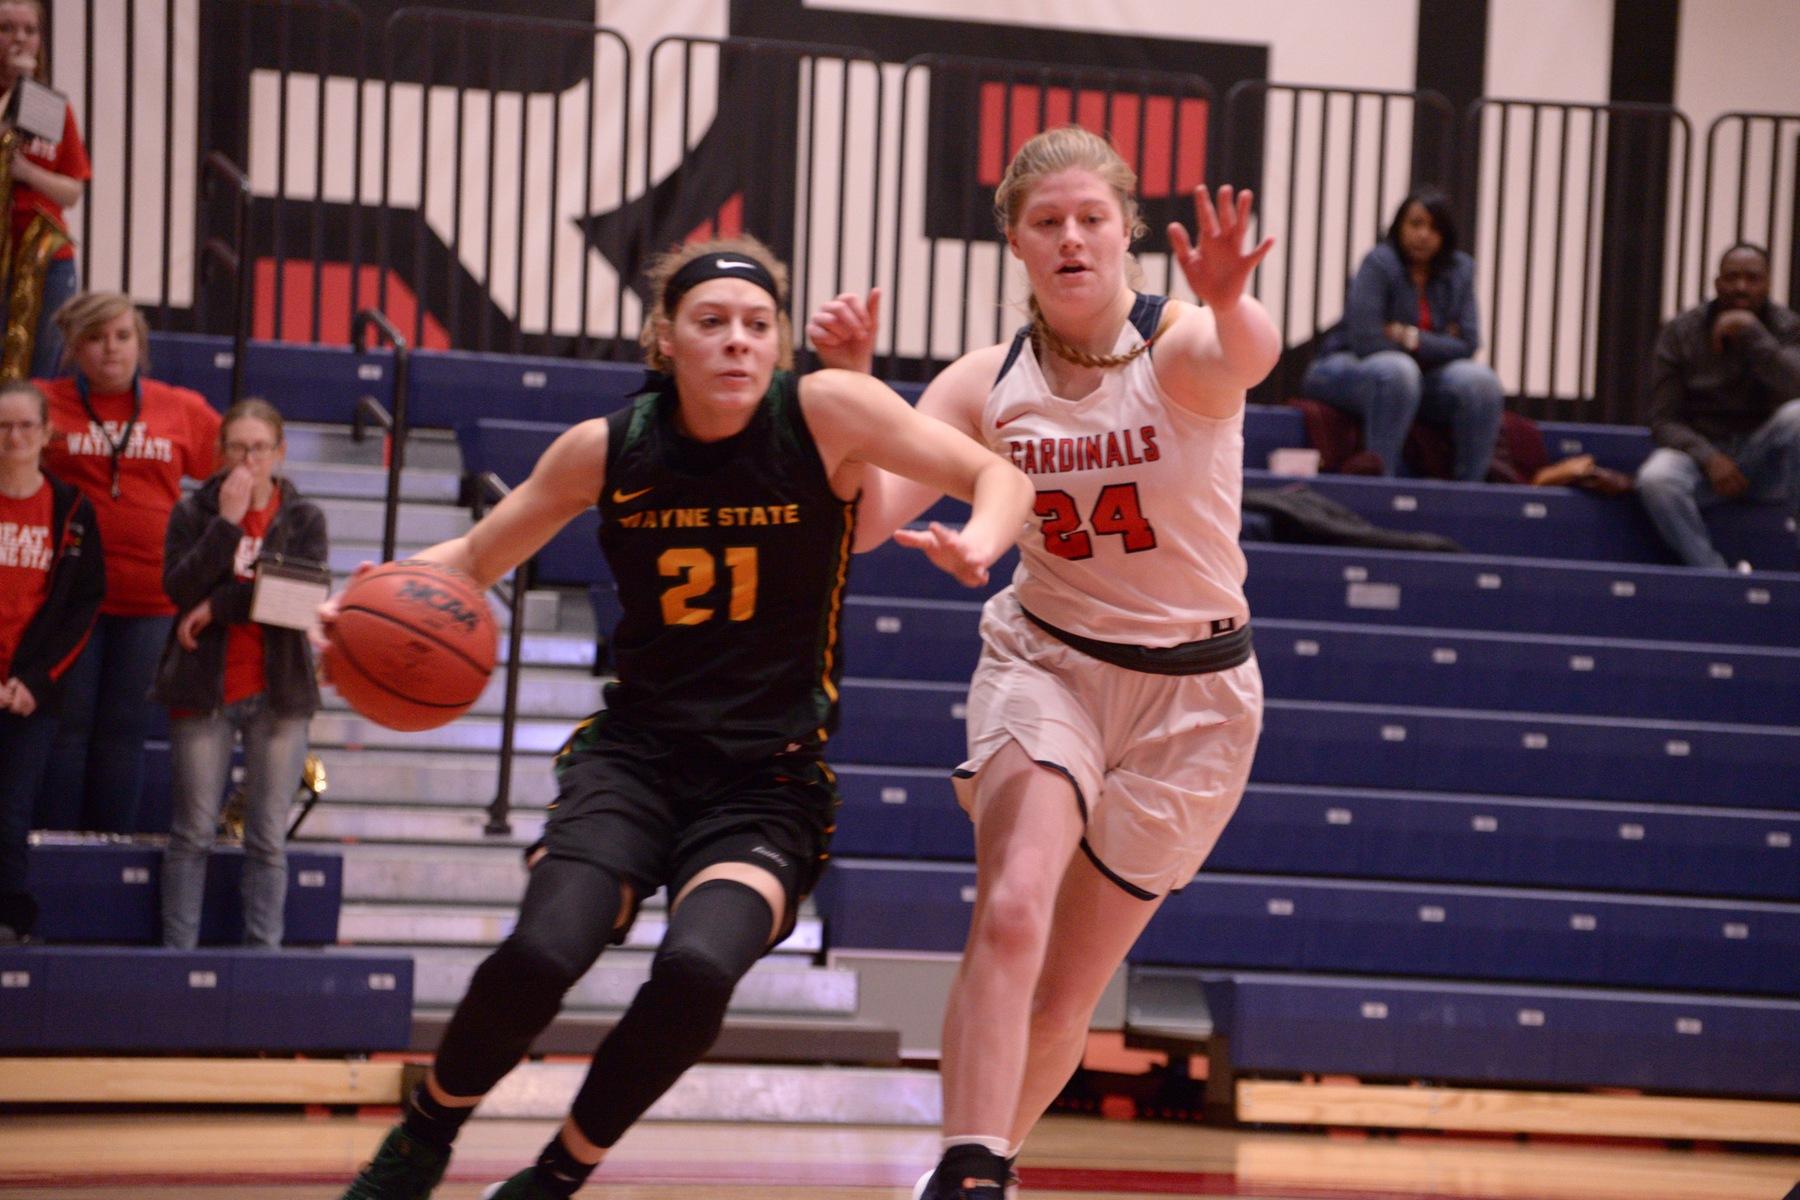 Women's Basketball vs Wayne State - Feb. 21. 2019 - Saginaw Valley State